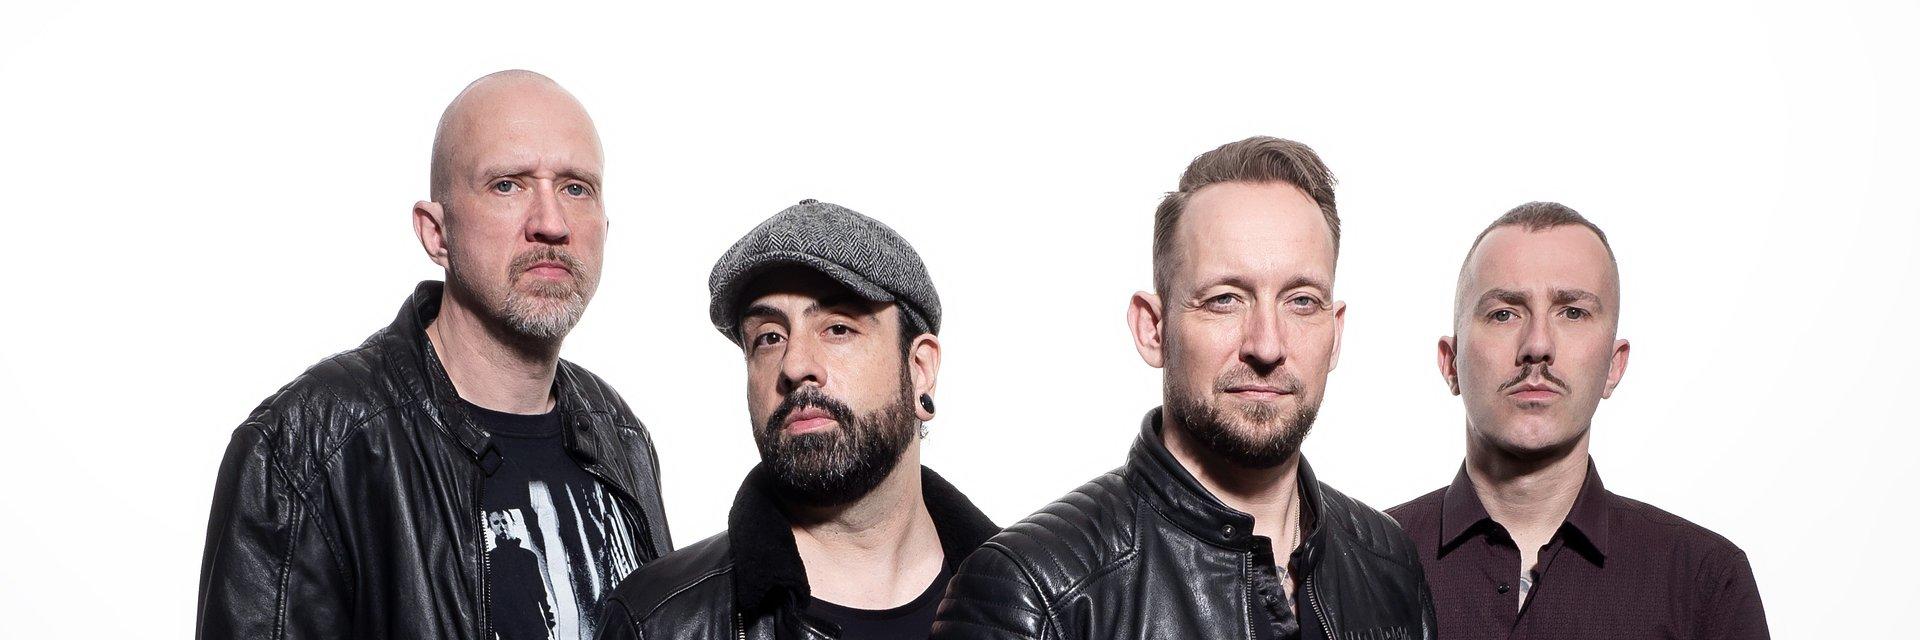 Introspekcyjna i drapieżna płyta Volbeat